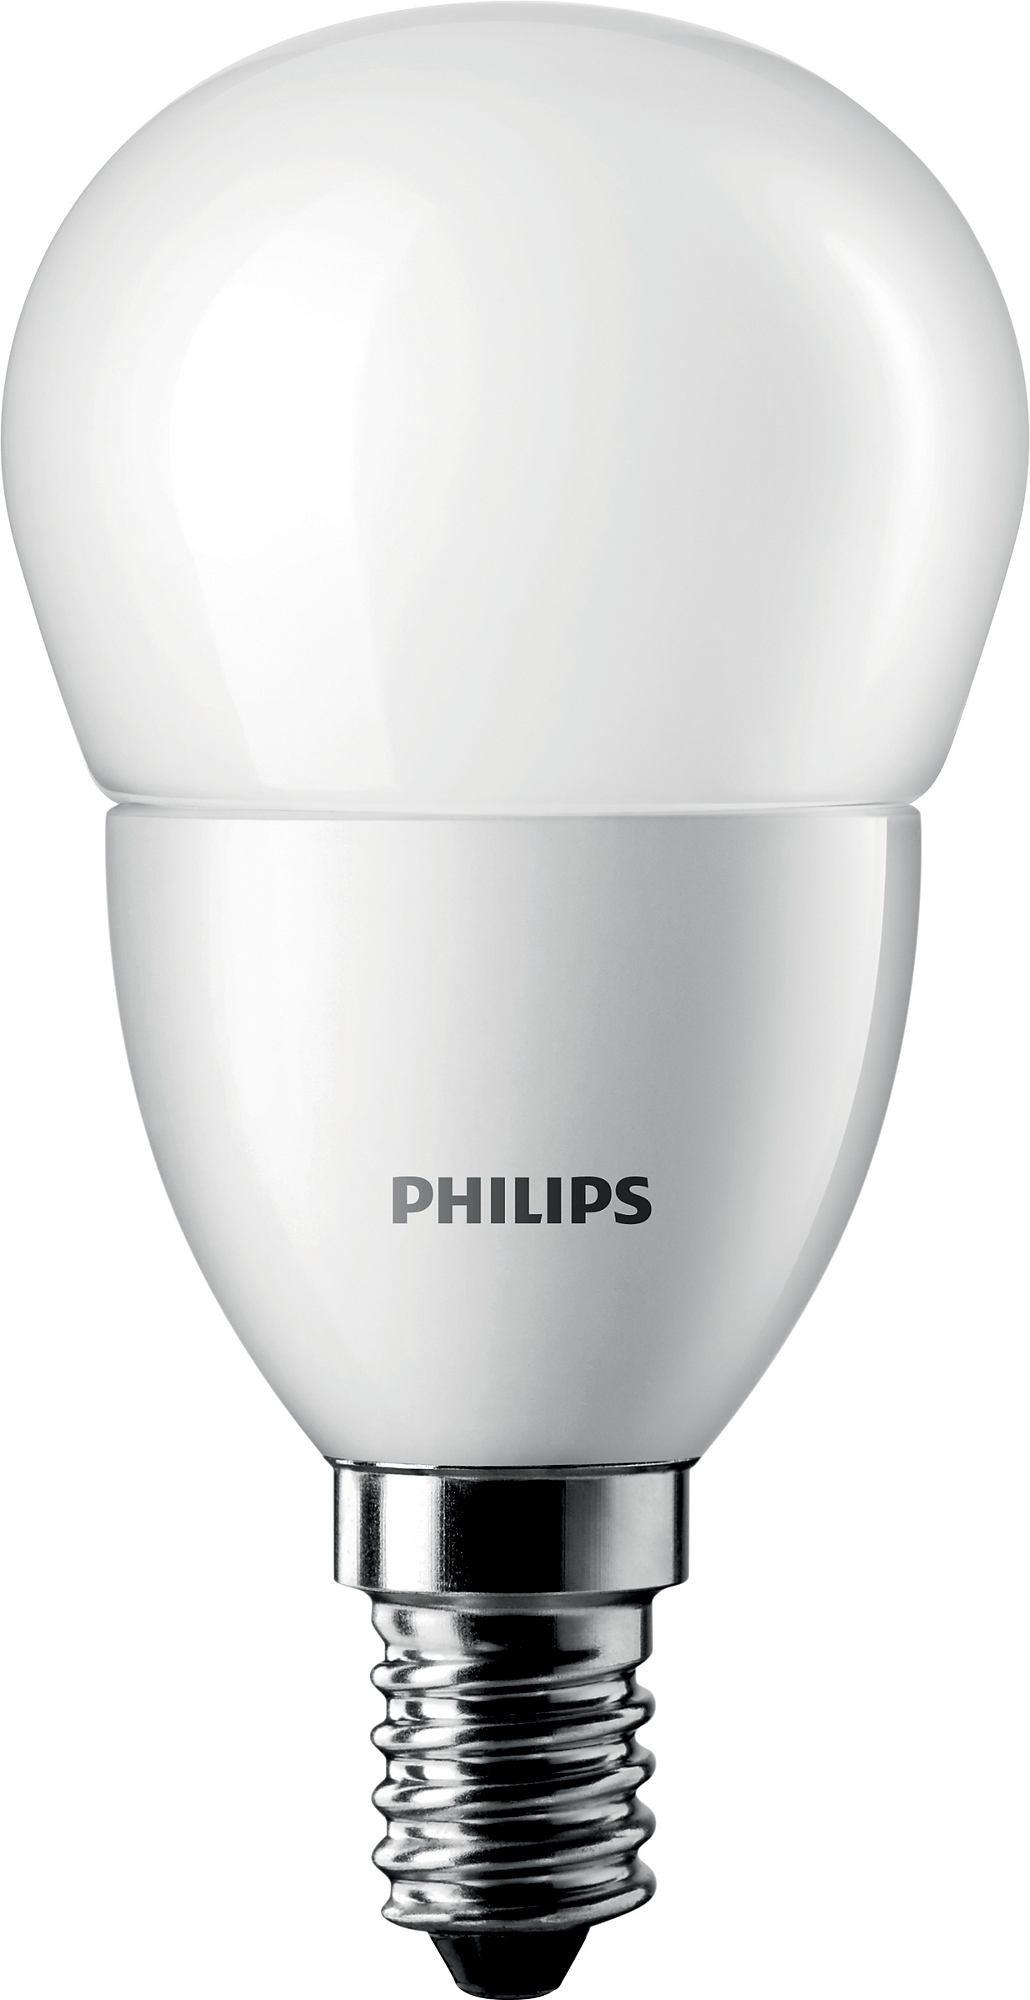 Philips CorePro LEDluster 2.7-25W E14 827 P48 FR